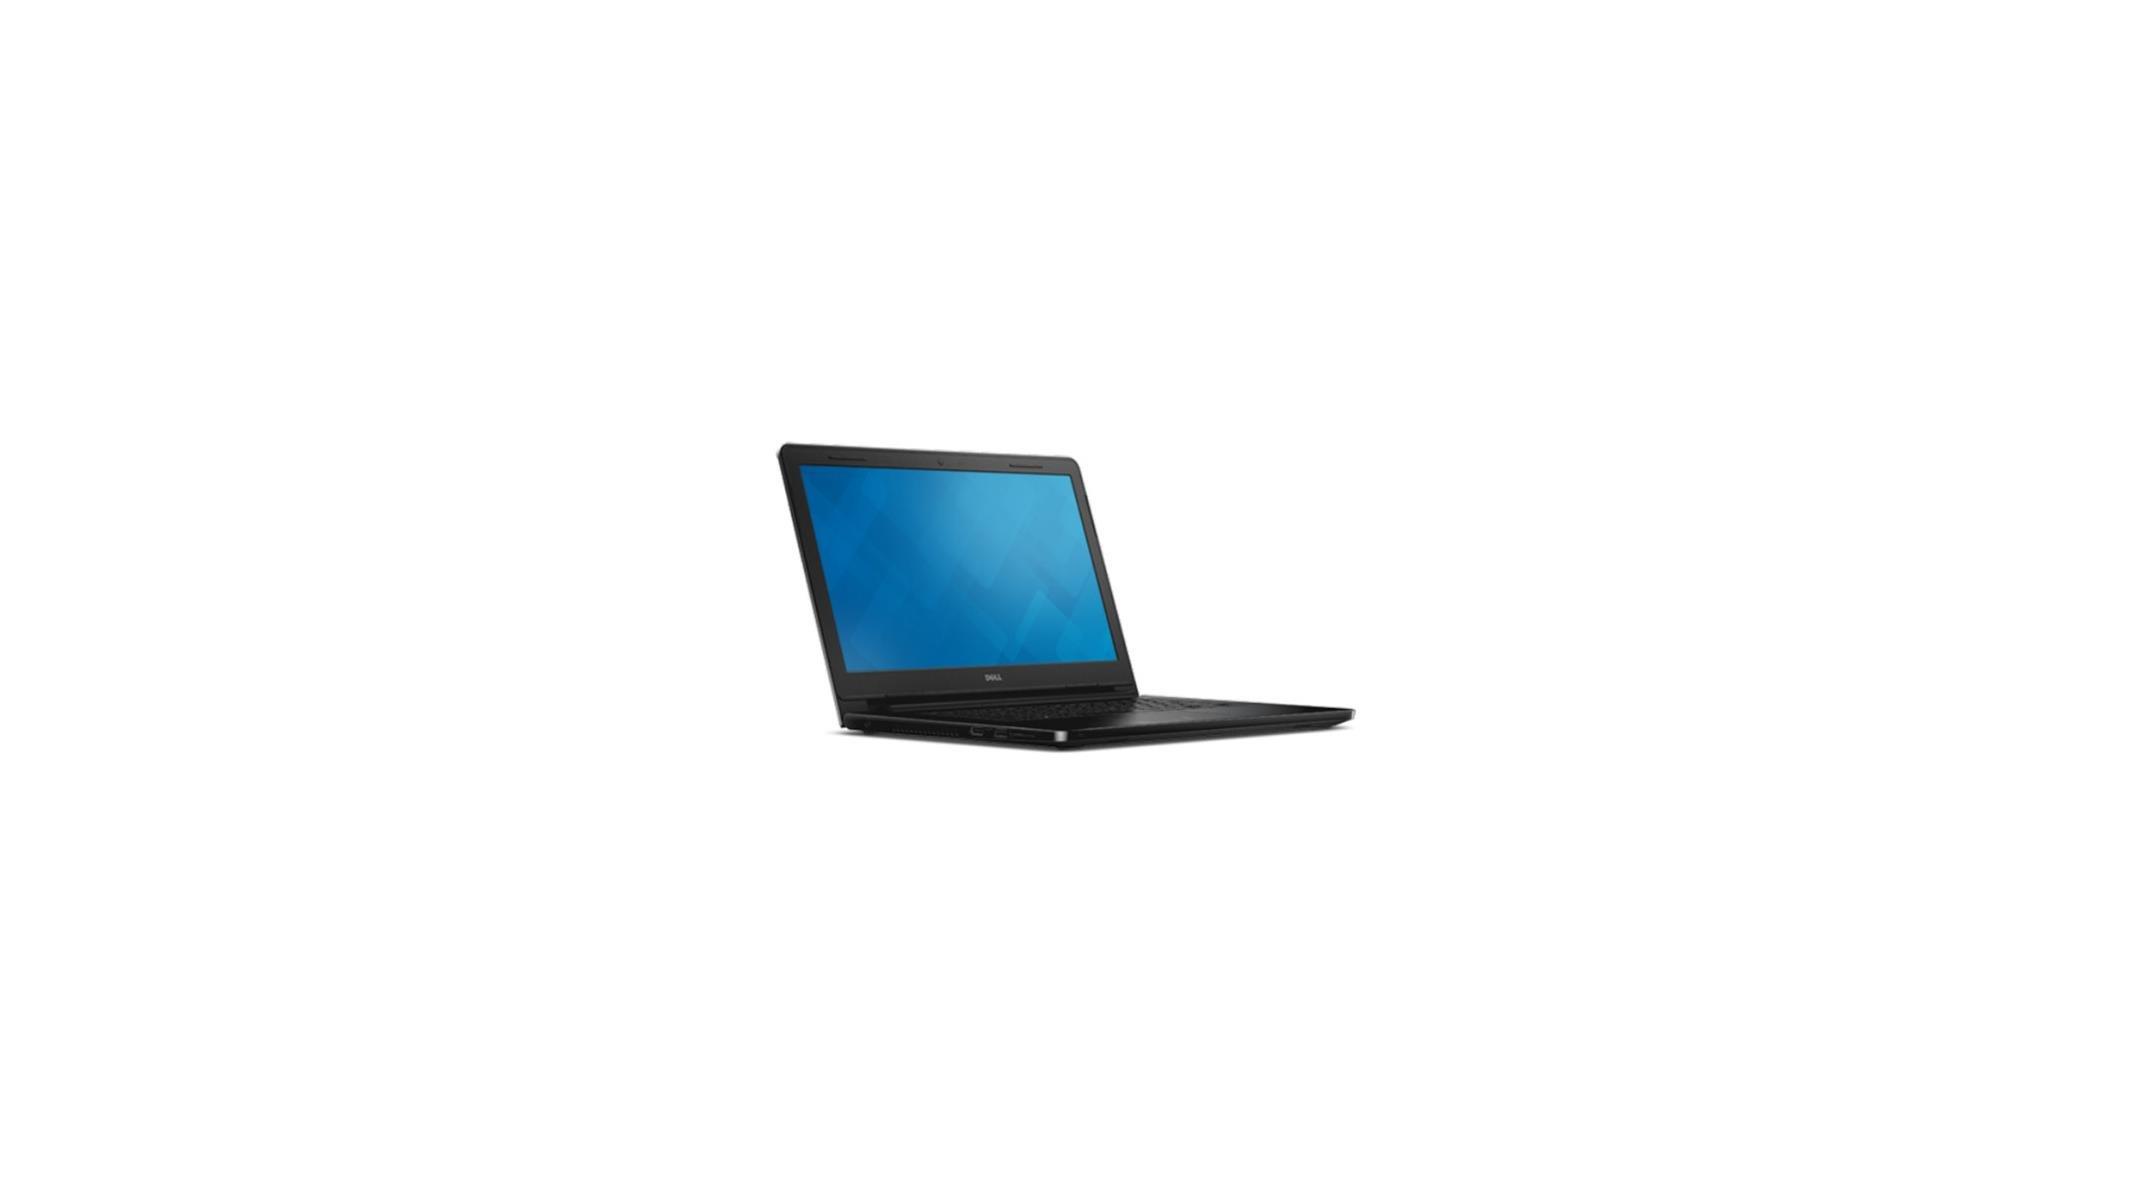 $180 Dell Inspiron Intel Celeron Laptop, 45% Off Asus AC1900 T